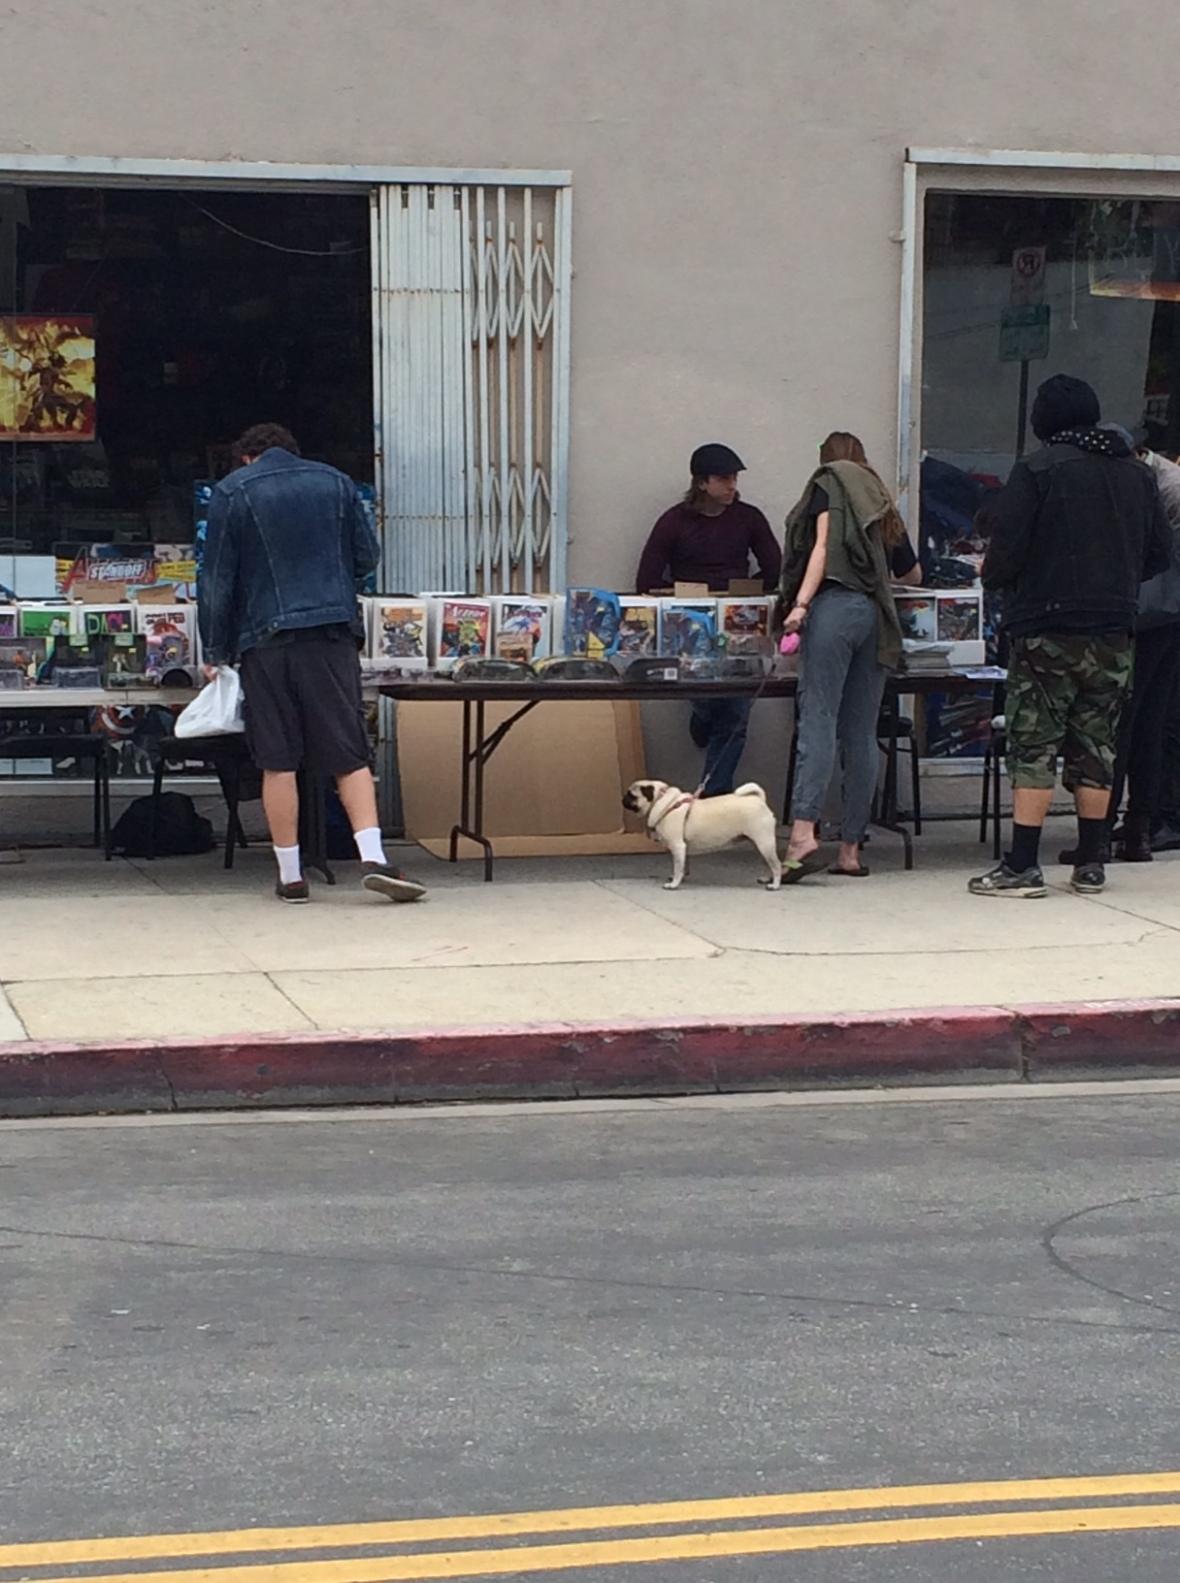 Comic book lovin' pug